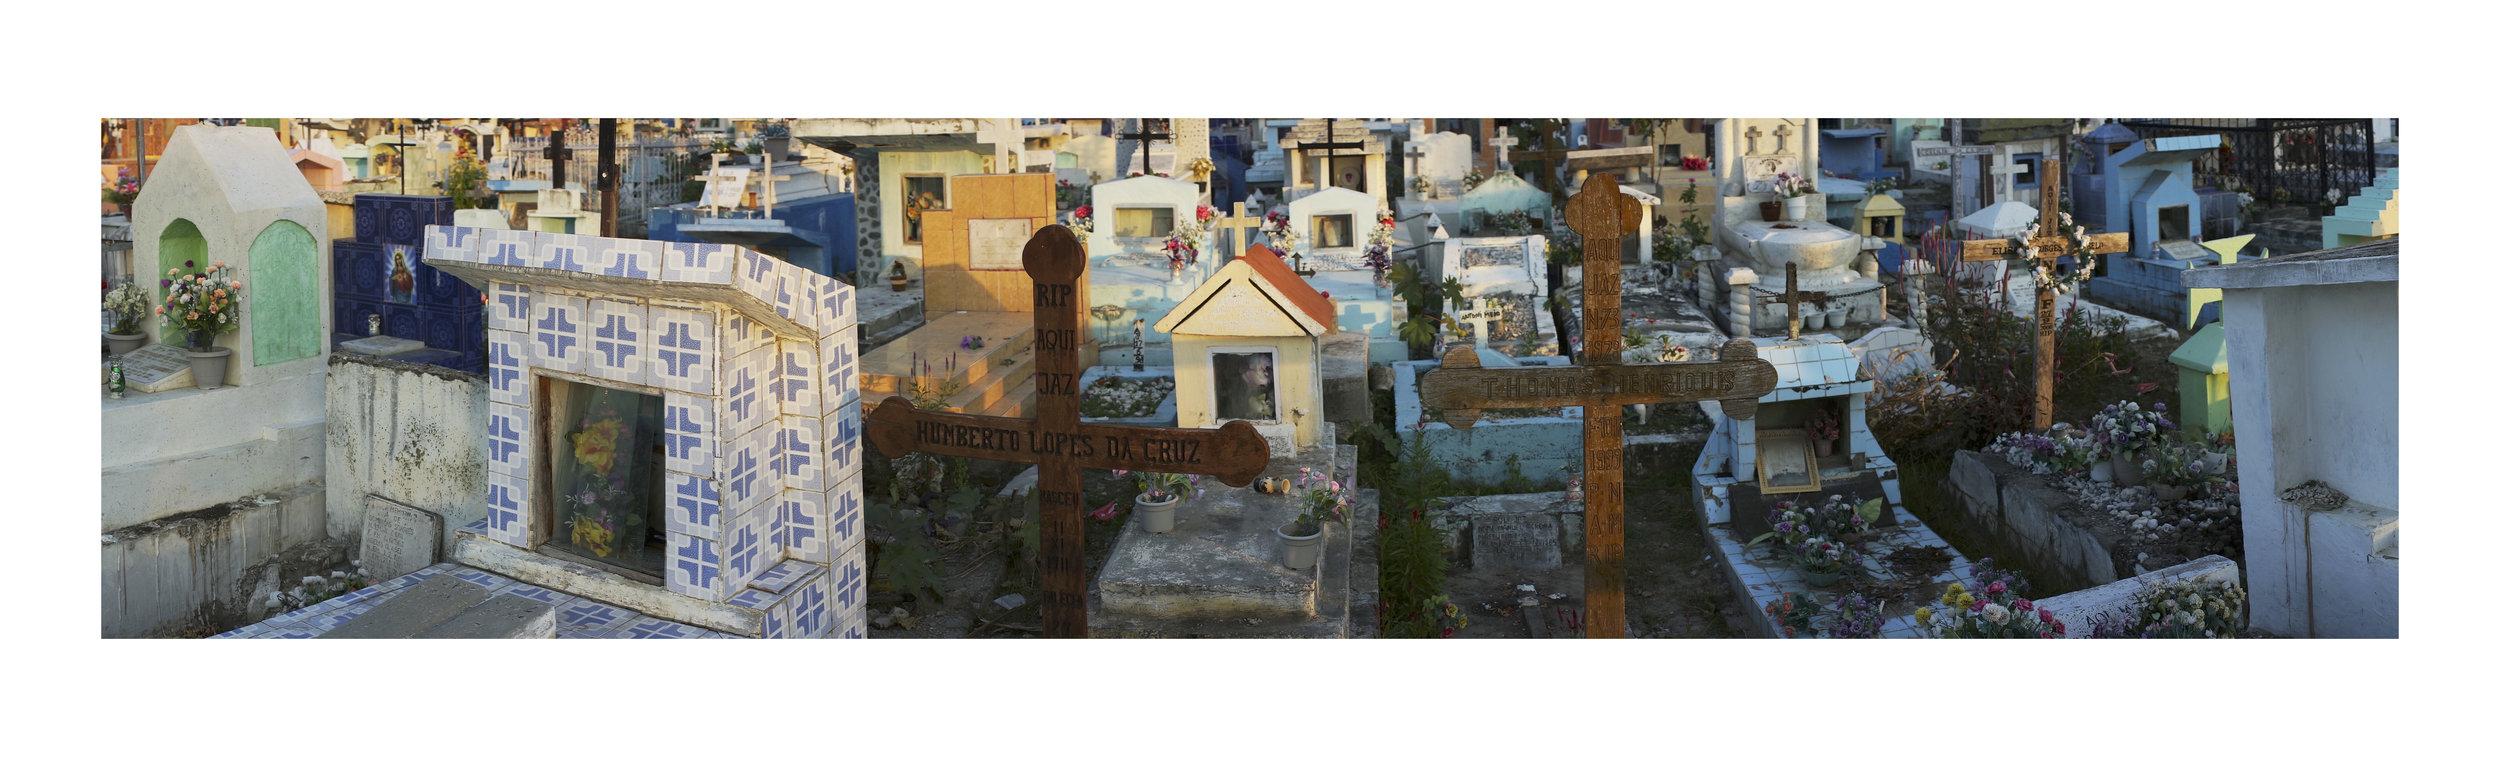 LYNDELL BROWN AND CHARLES GREEN   Santa Cruz, Dusk 3  2018 Digital Photograph on Rag Paper, Framed 87 x 290 cm